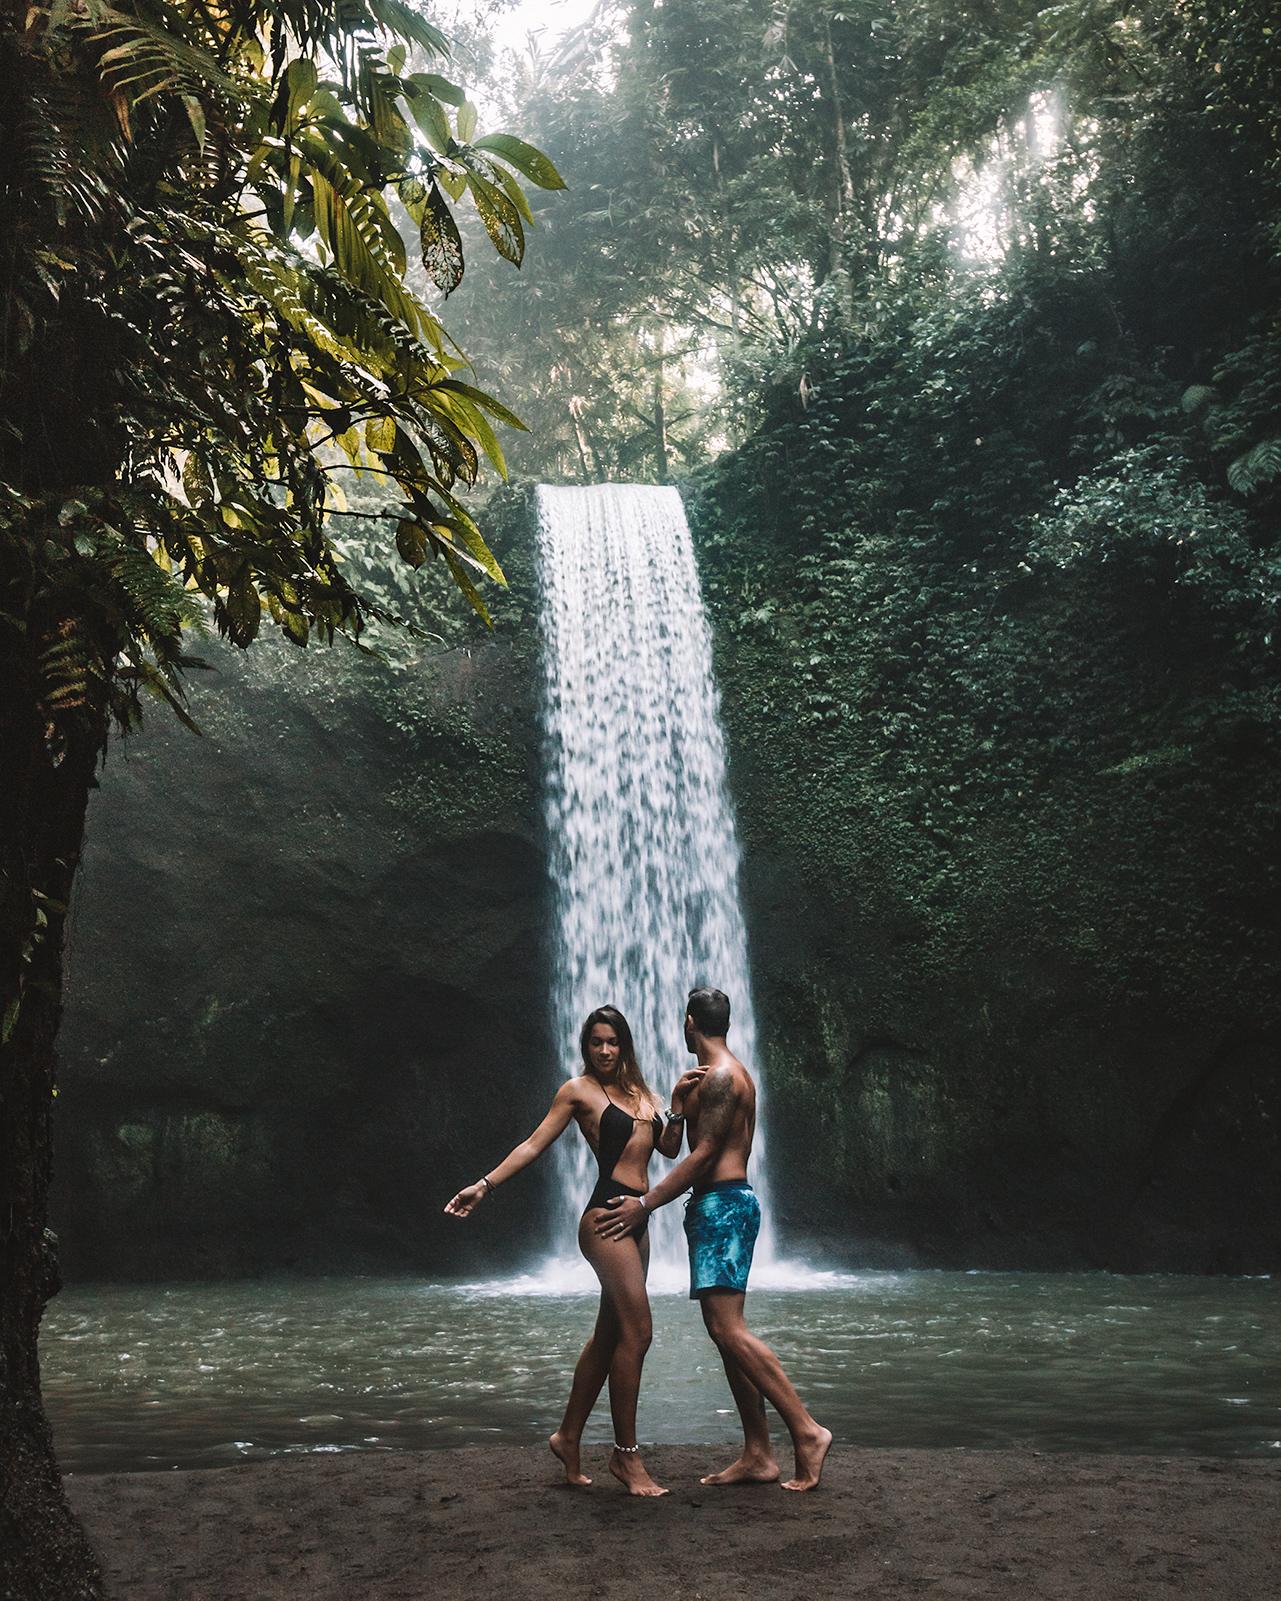 unique tibumana waterfall bali indonesia travel couple freeoversea beautiful photography amazing nature